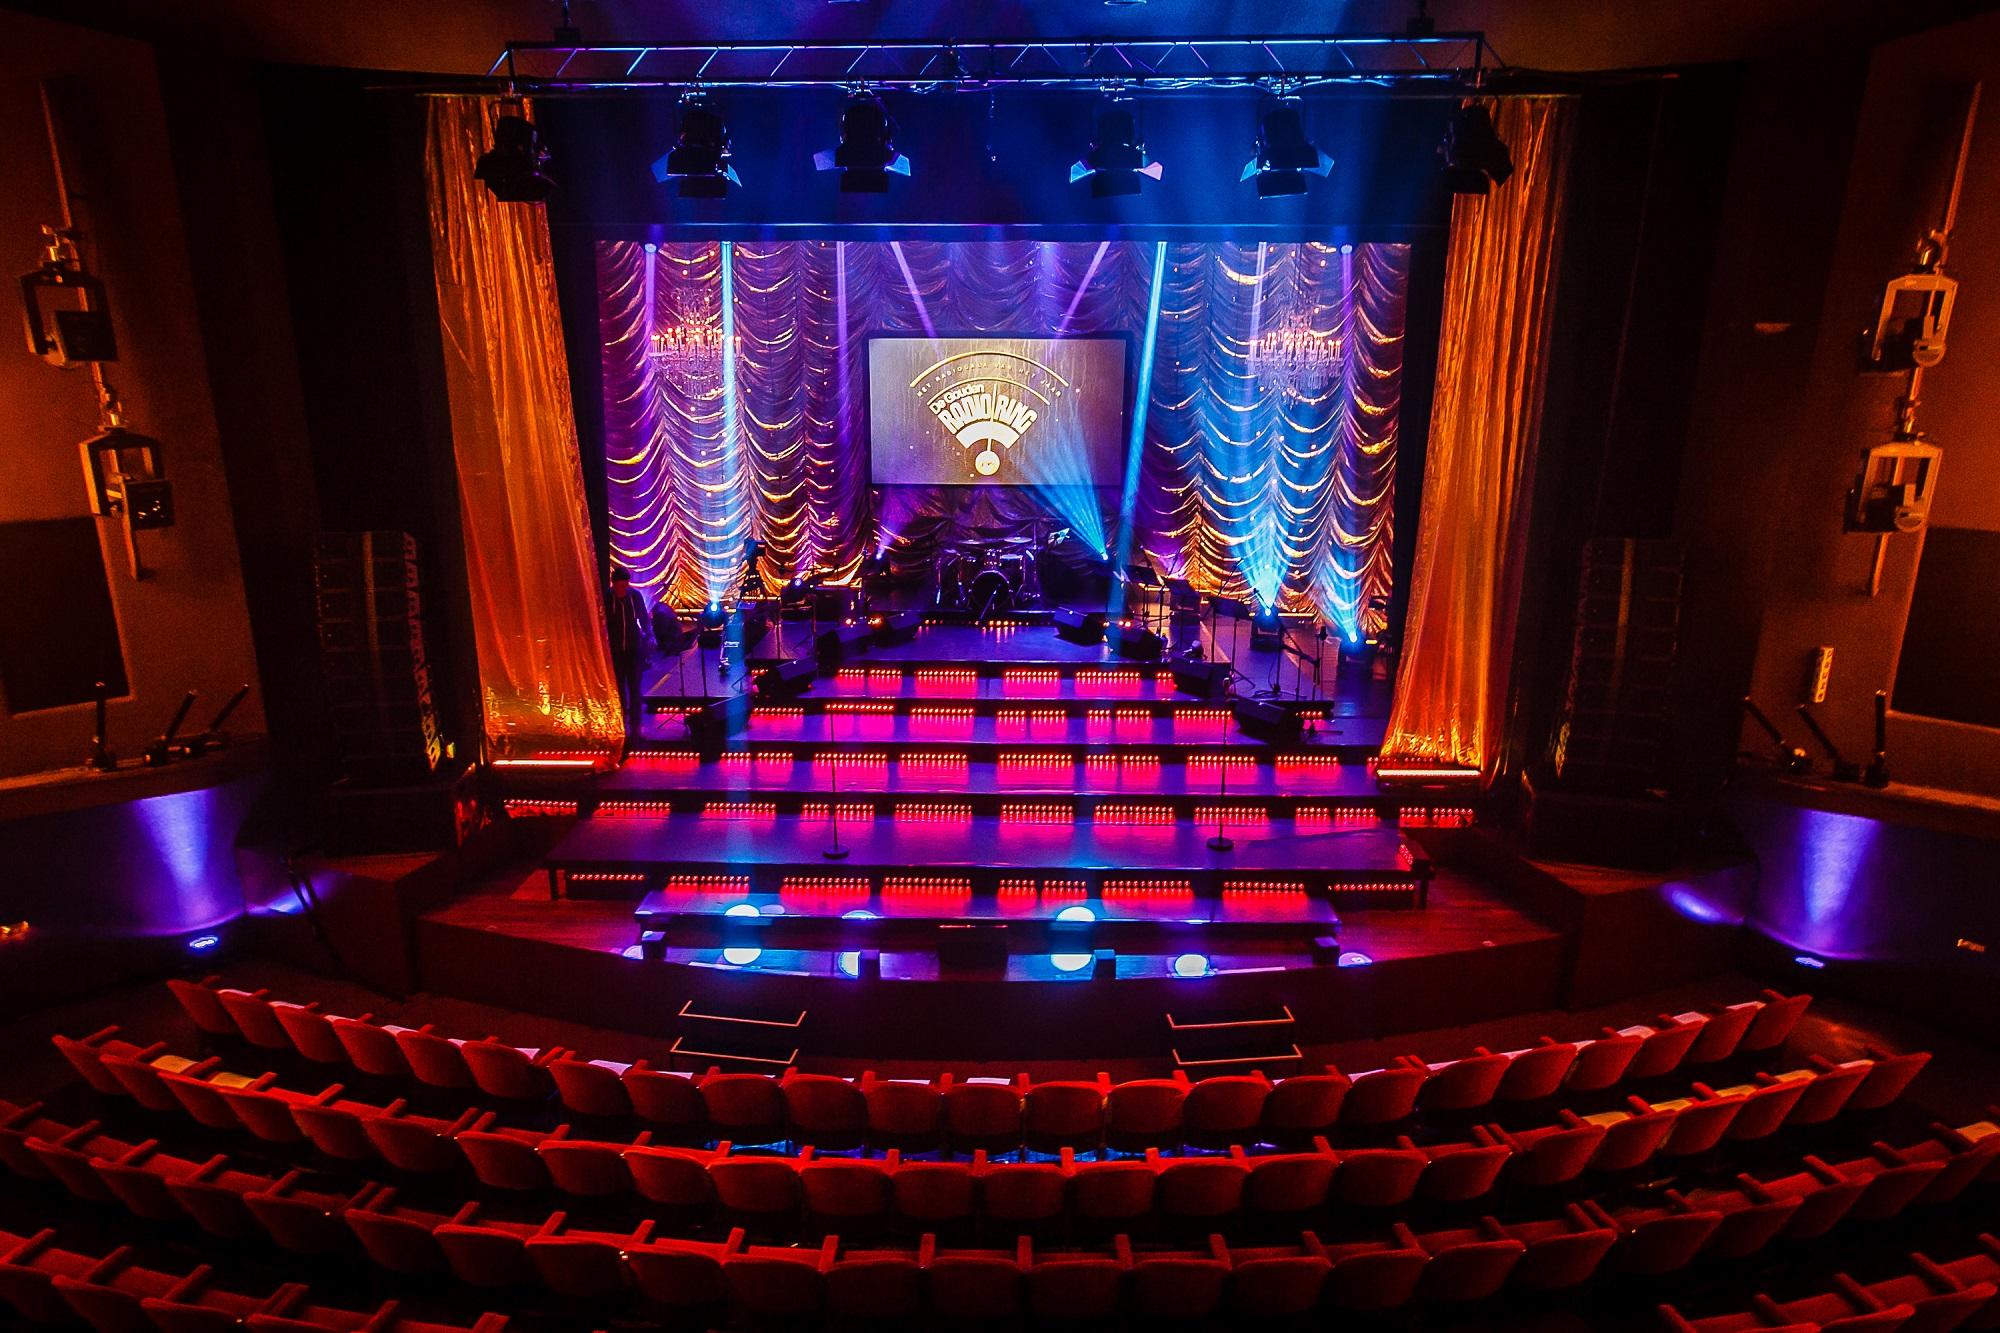 Gooiland Theater, Hilversum